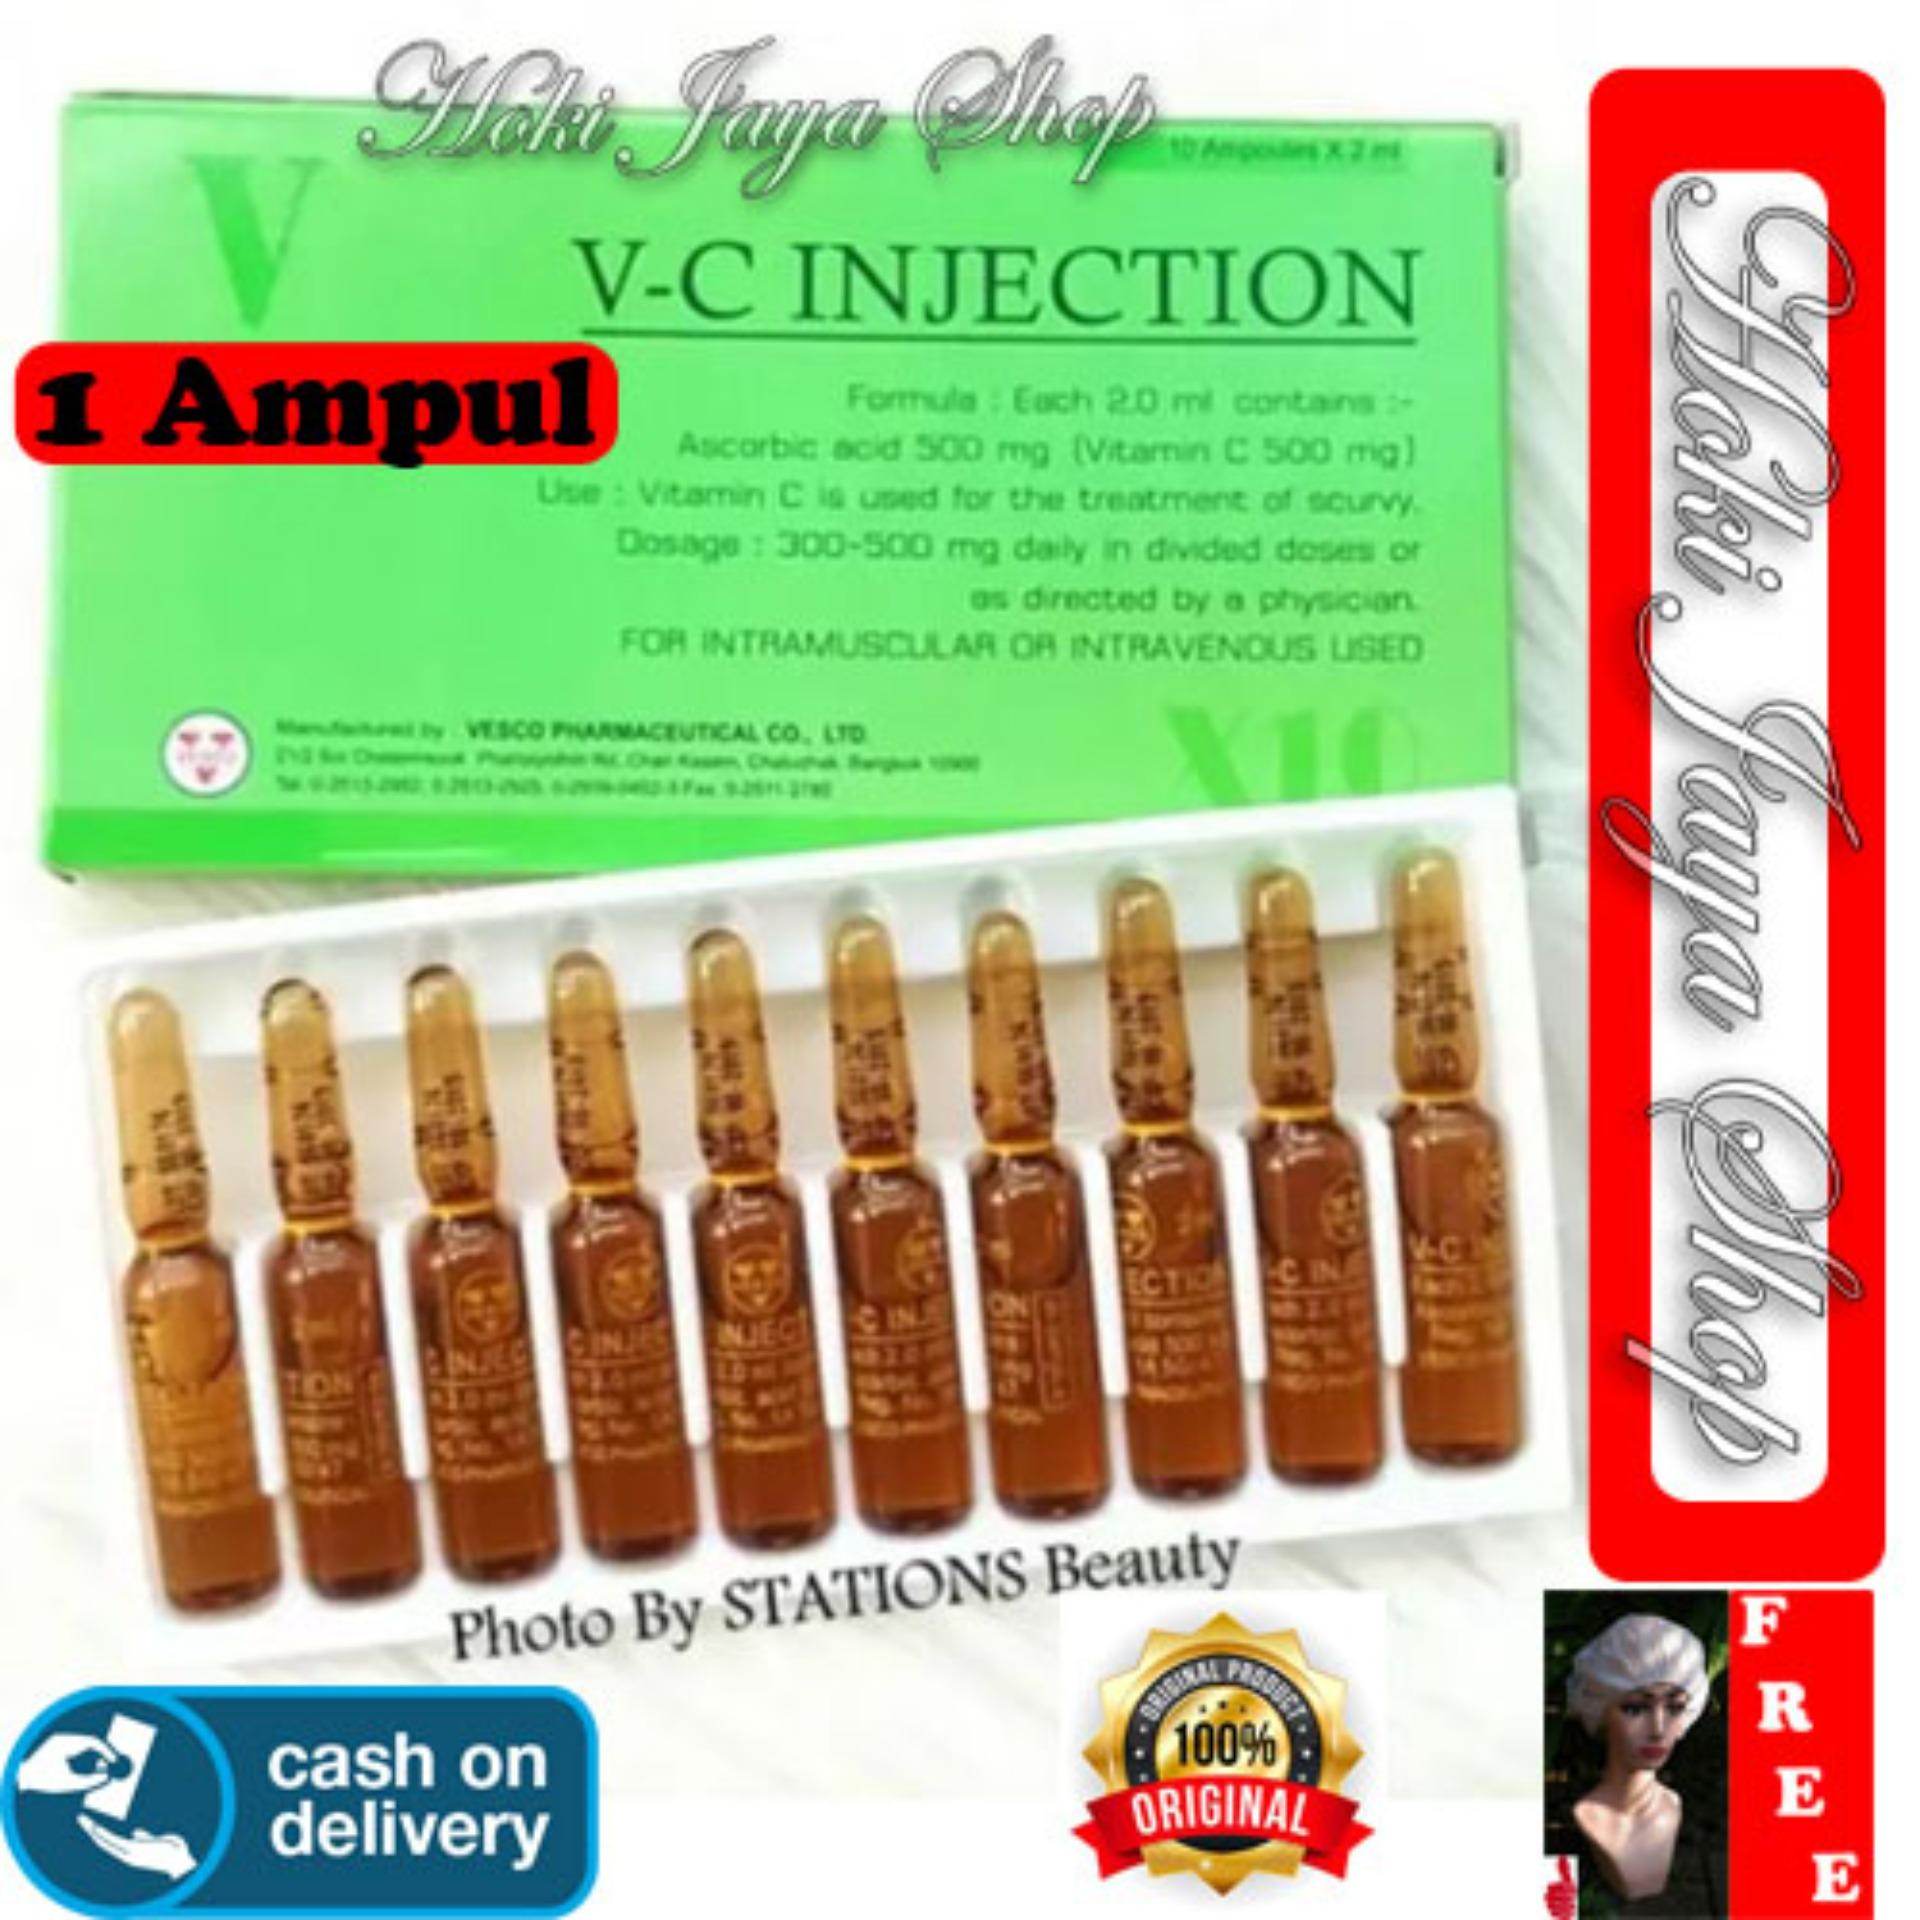 HOKI COD - VC Injection Isi 1 AMPUL - / Vitamin C Injection / VC Injeksi / Serum Vitamin C Ascorib Acid 100% Original Thailand - GM 1 + Gratis Shower Cap Putih - Premium